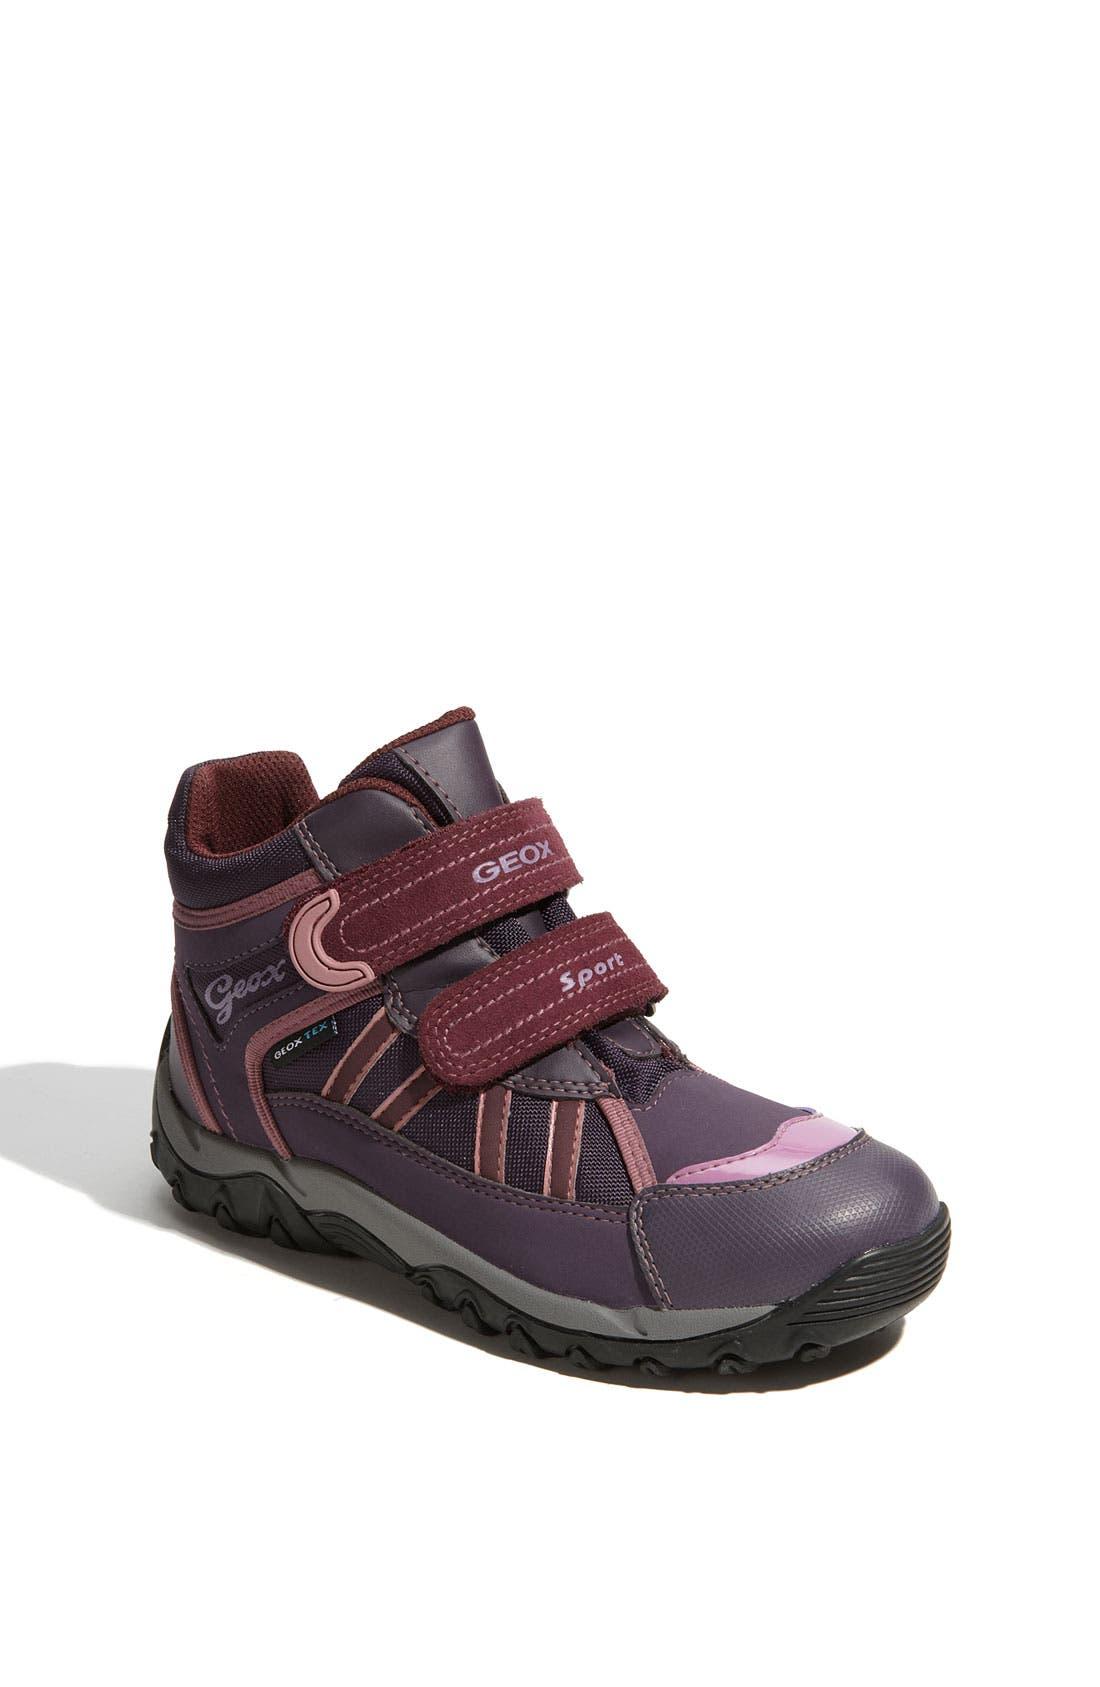 Alternate Image 1 Selected - Geox 'Alaska' Boot (Toddler, Little Kid & Big Kid)